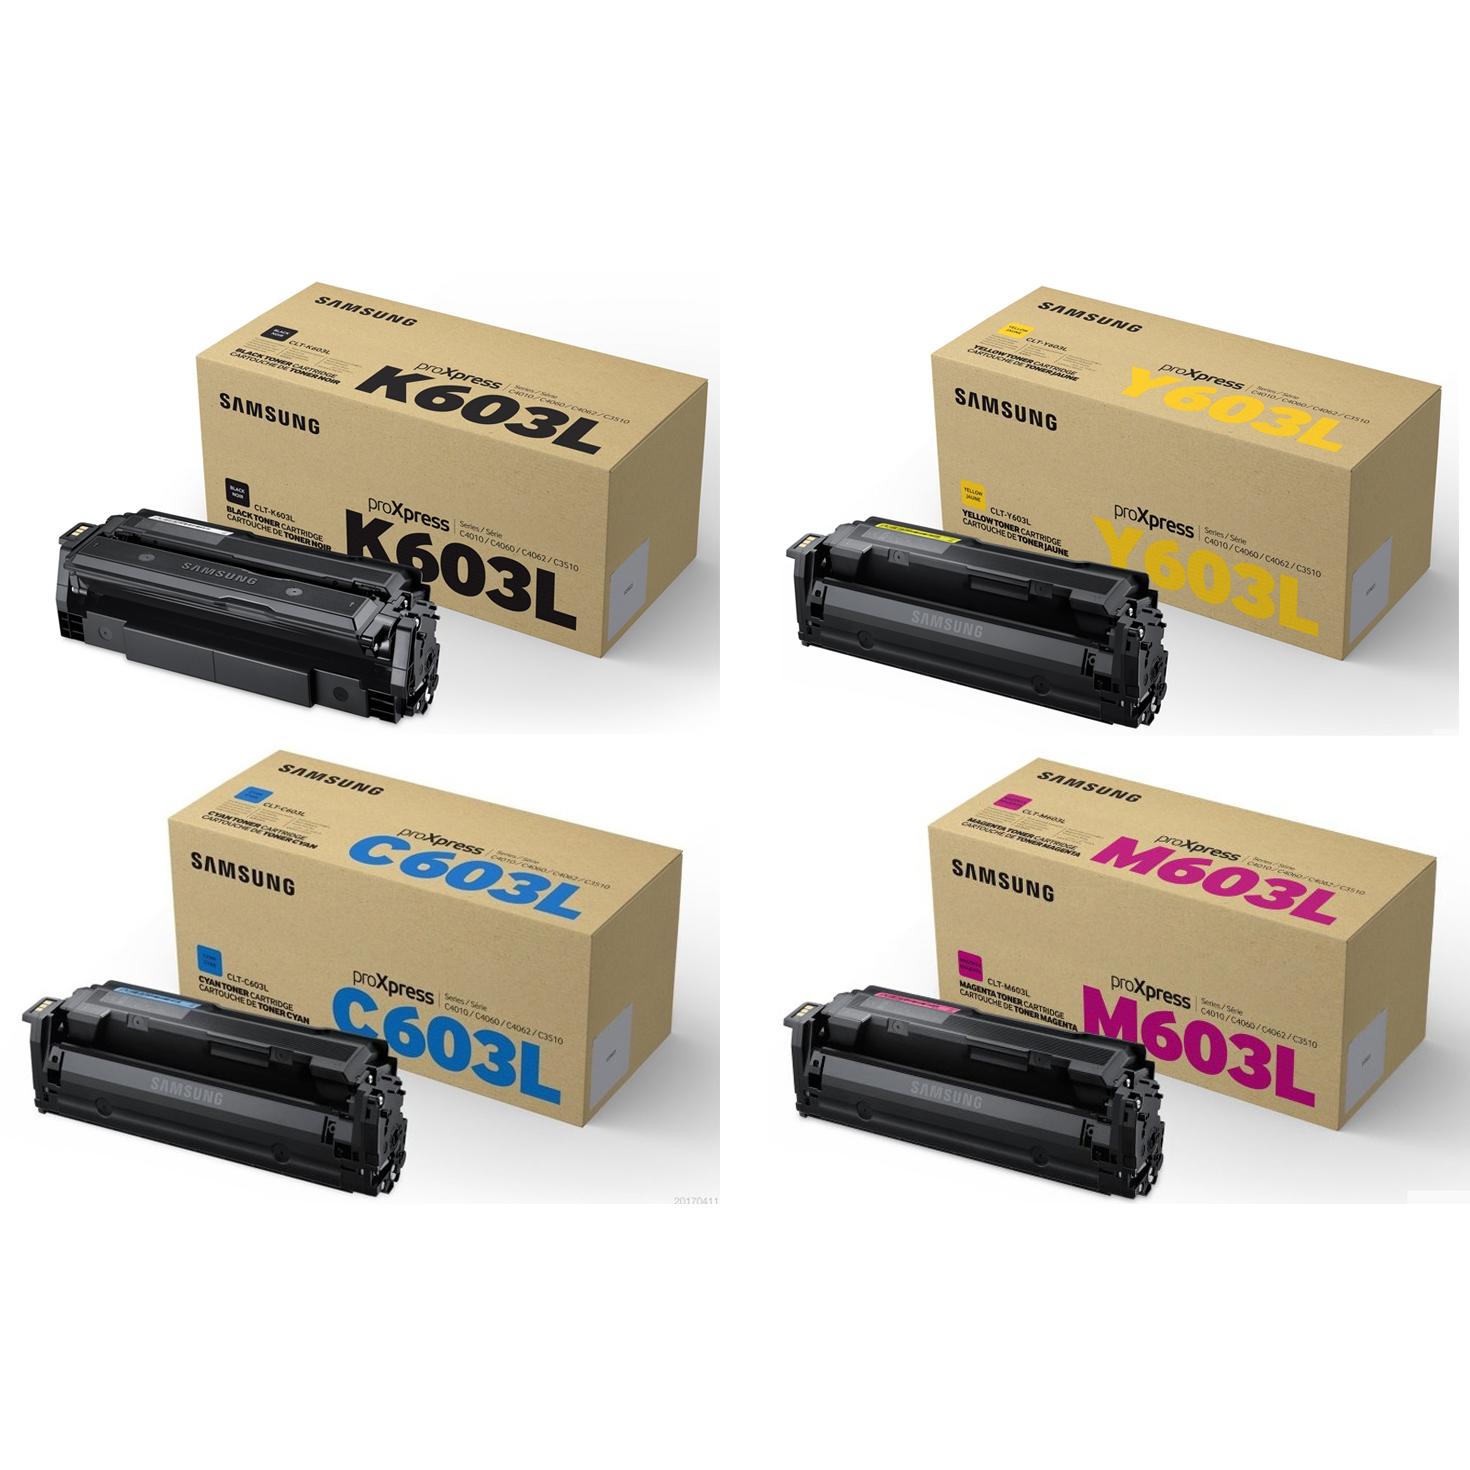 Original Samsung Clt 603l Cmyk Multipack High Capacity Toner Cas Hp Samung Cartridges Su214a Su080a